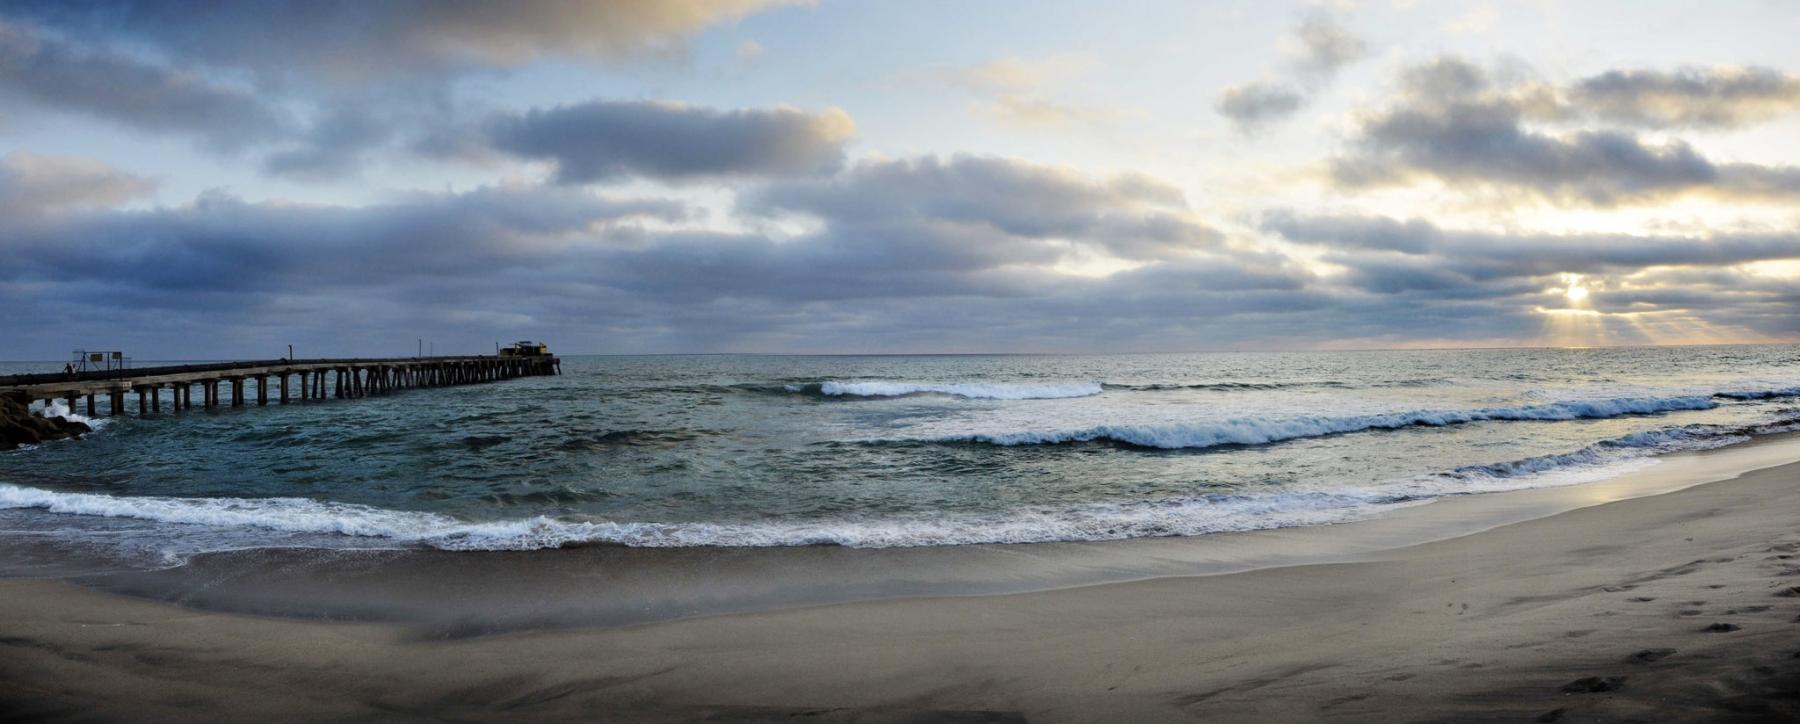 MarBravo Beach